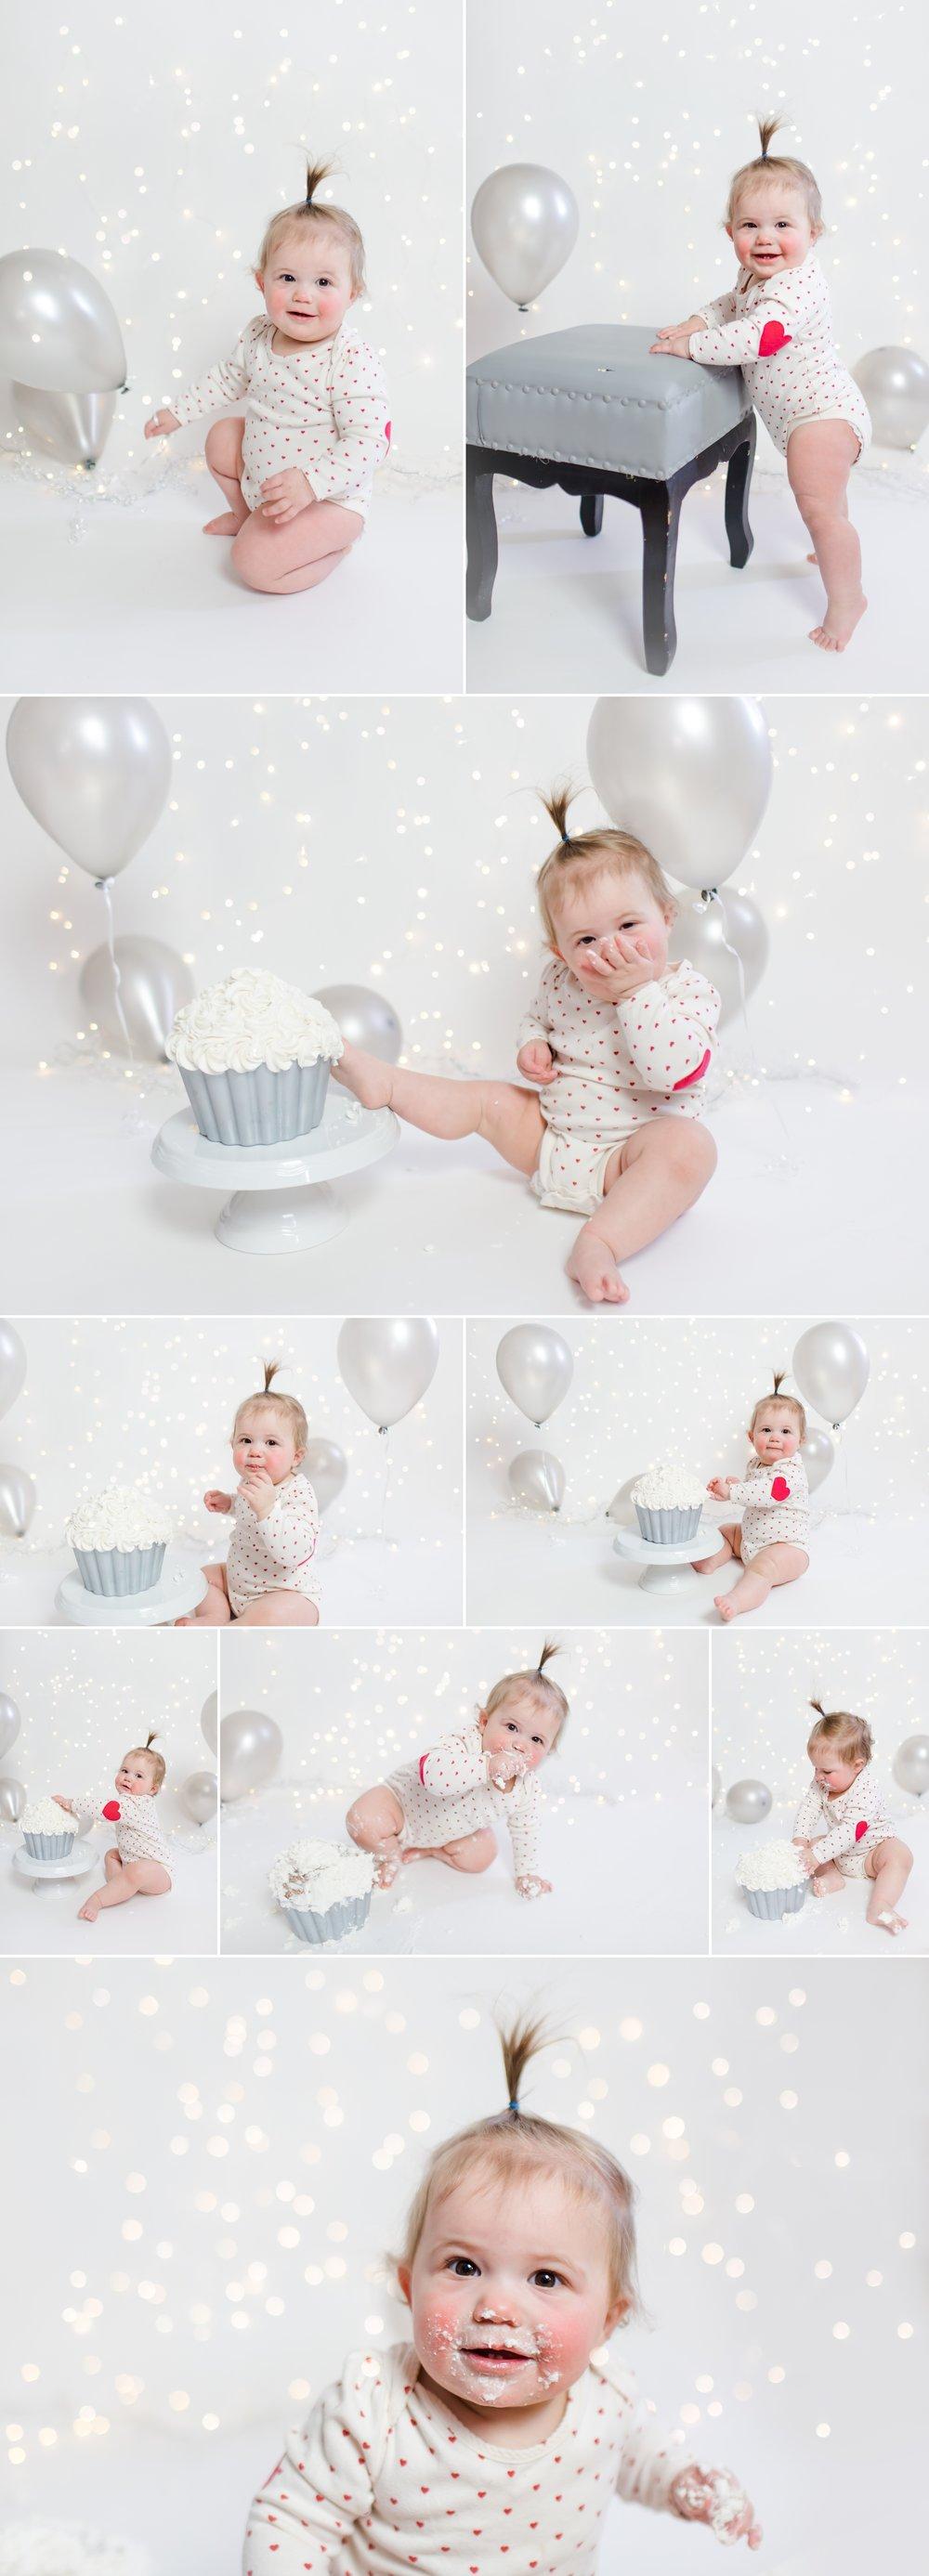 12_month_birthday_photography_cake_smash_girl_portraits_photo_props_ideas 3